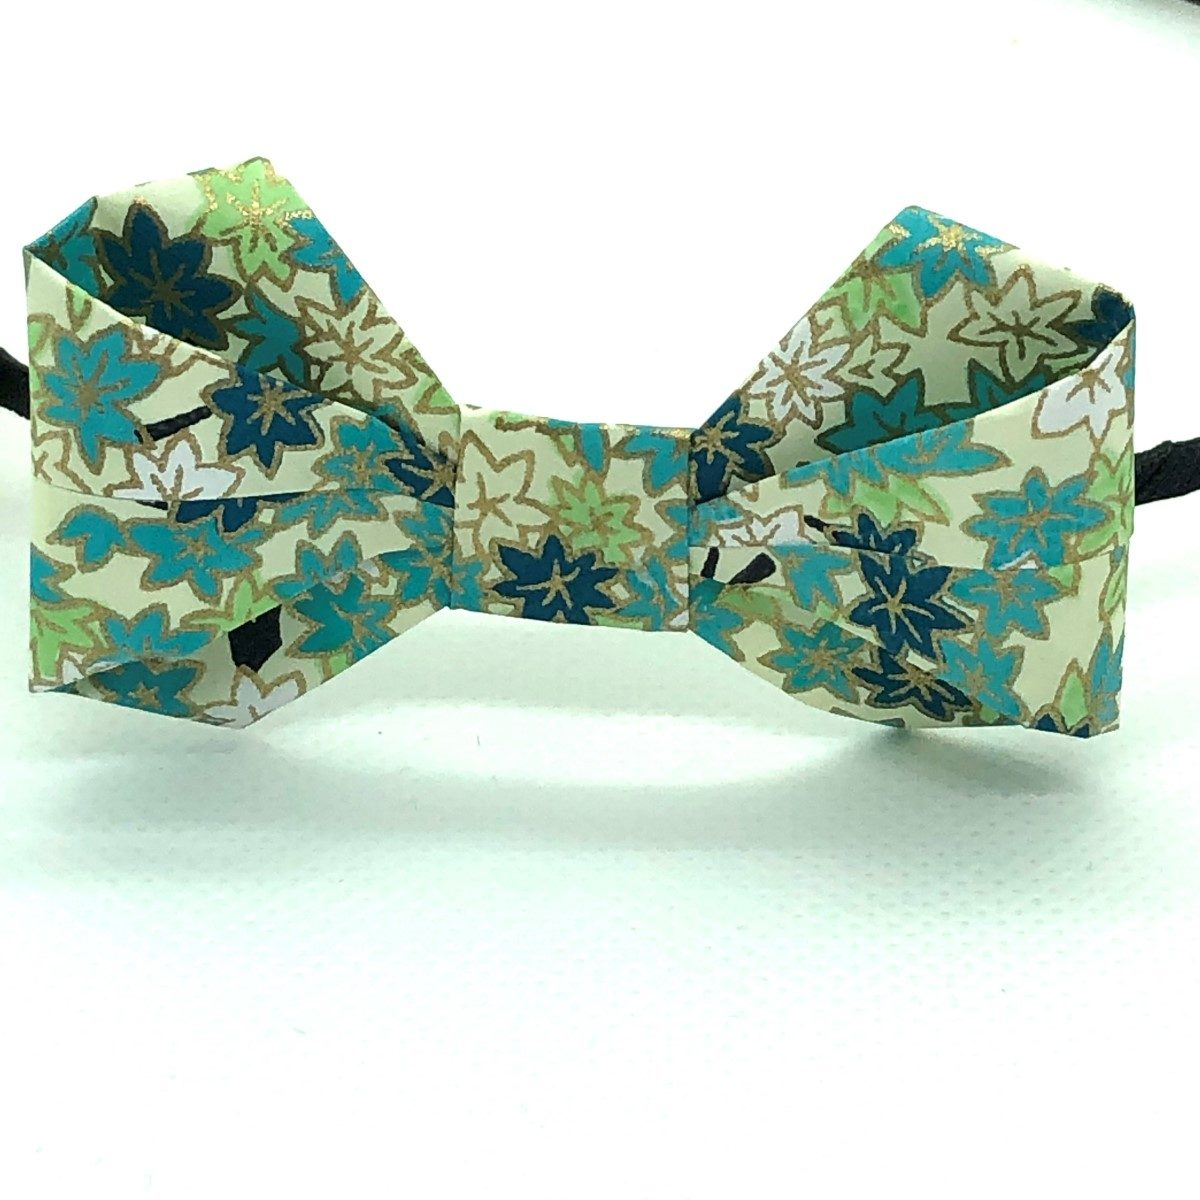 Serre-tête avec nœud en origami bleu turquoise